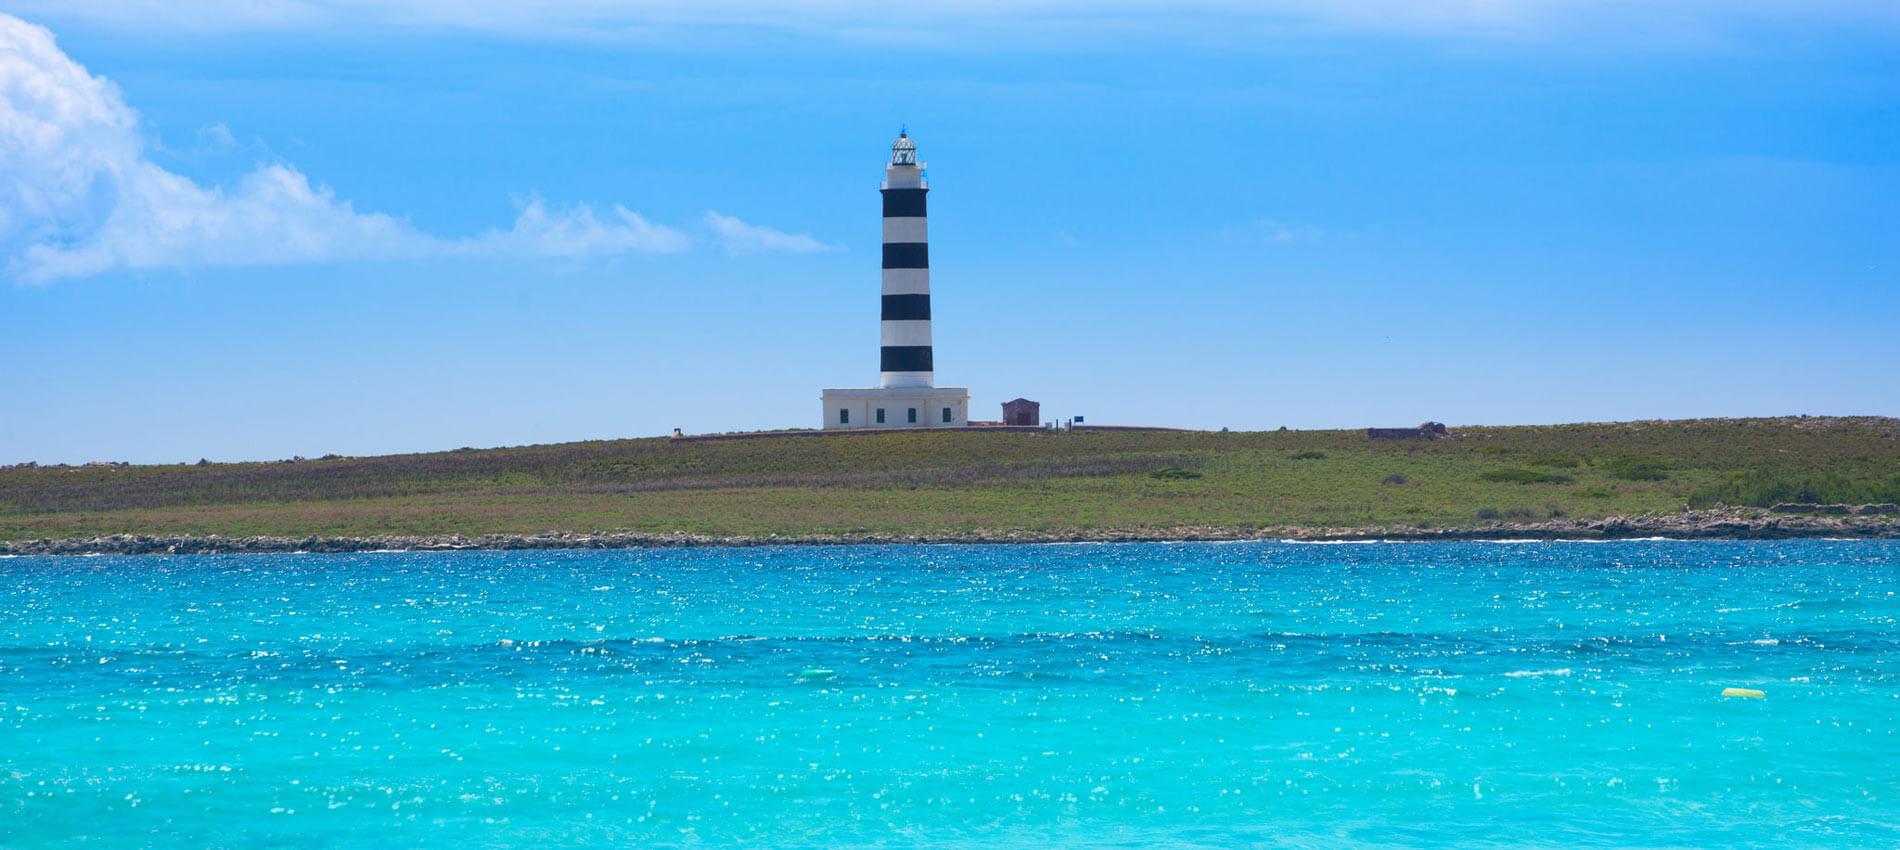 isla_de_aire_punta_prima